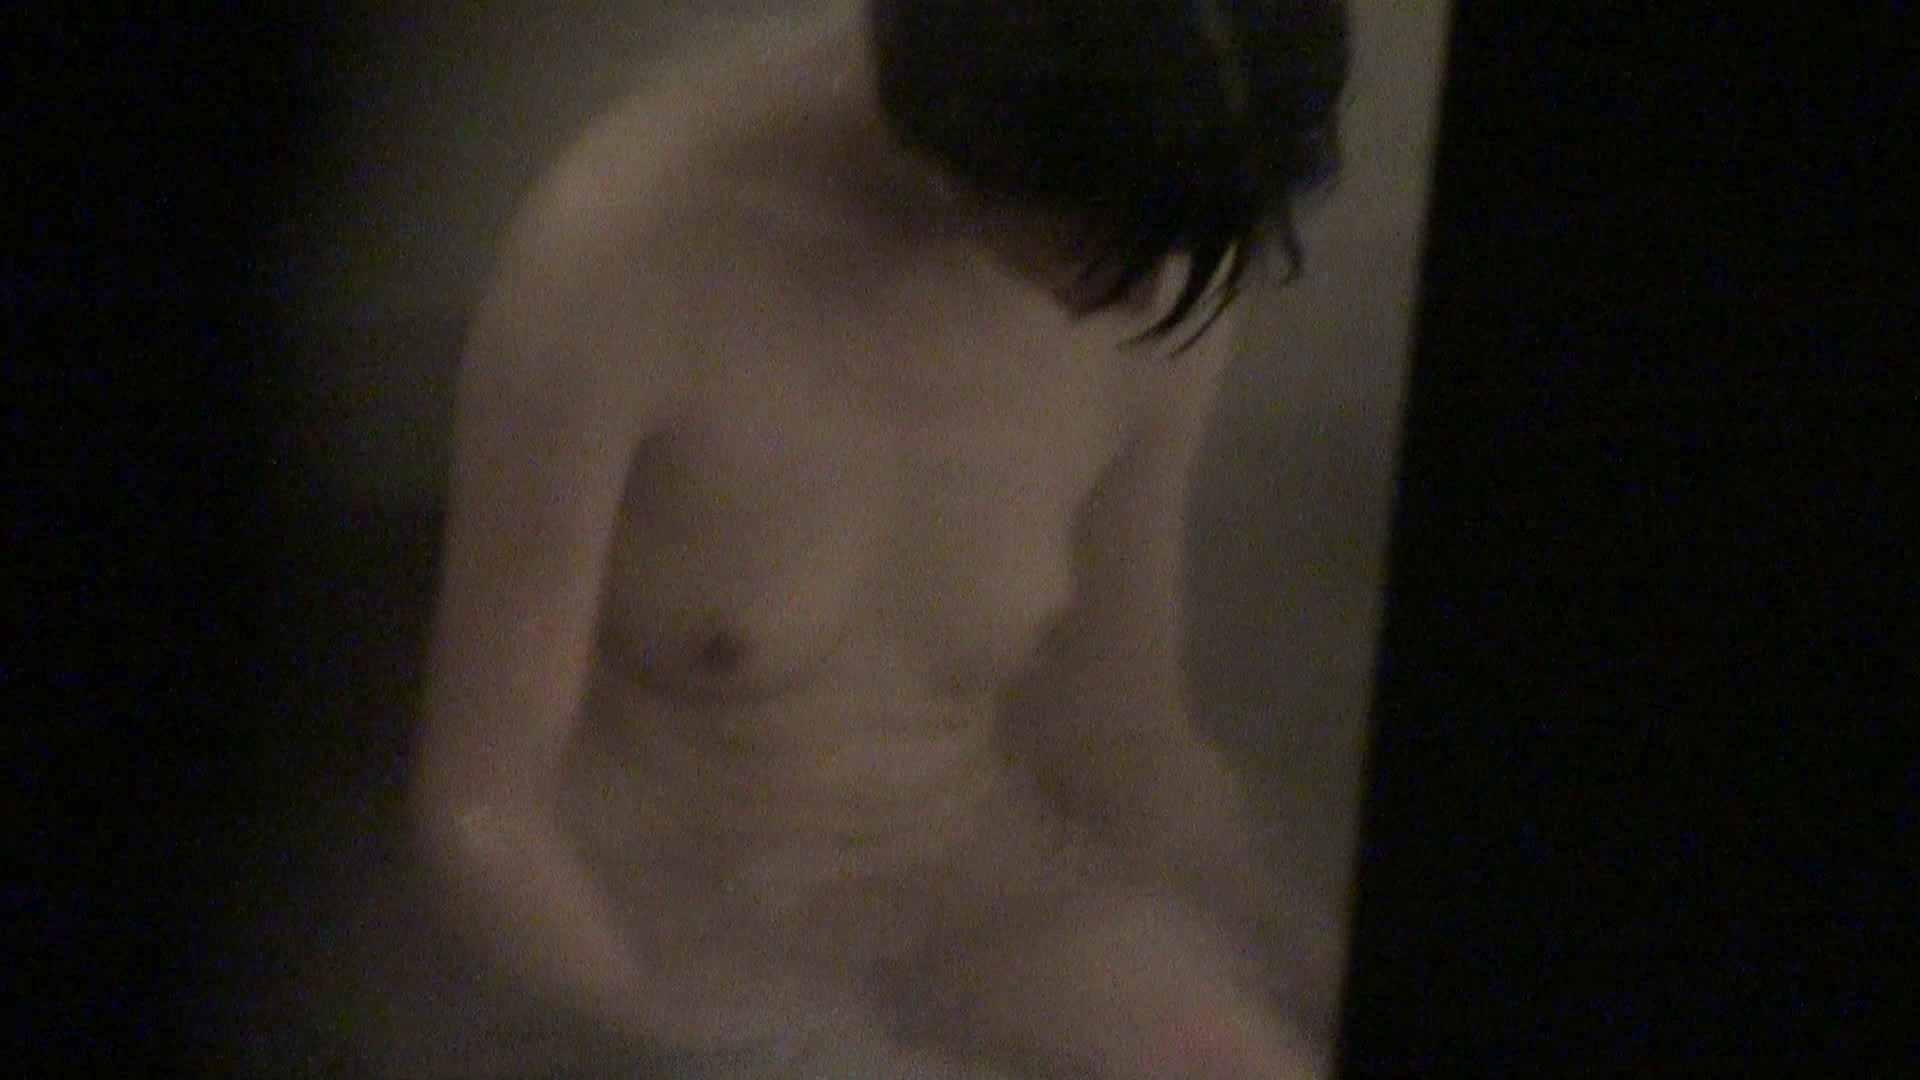 Aquaな露天風呂Vol.438 0 | 0  65連発 23